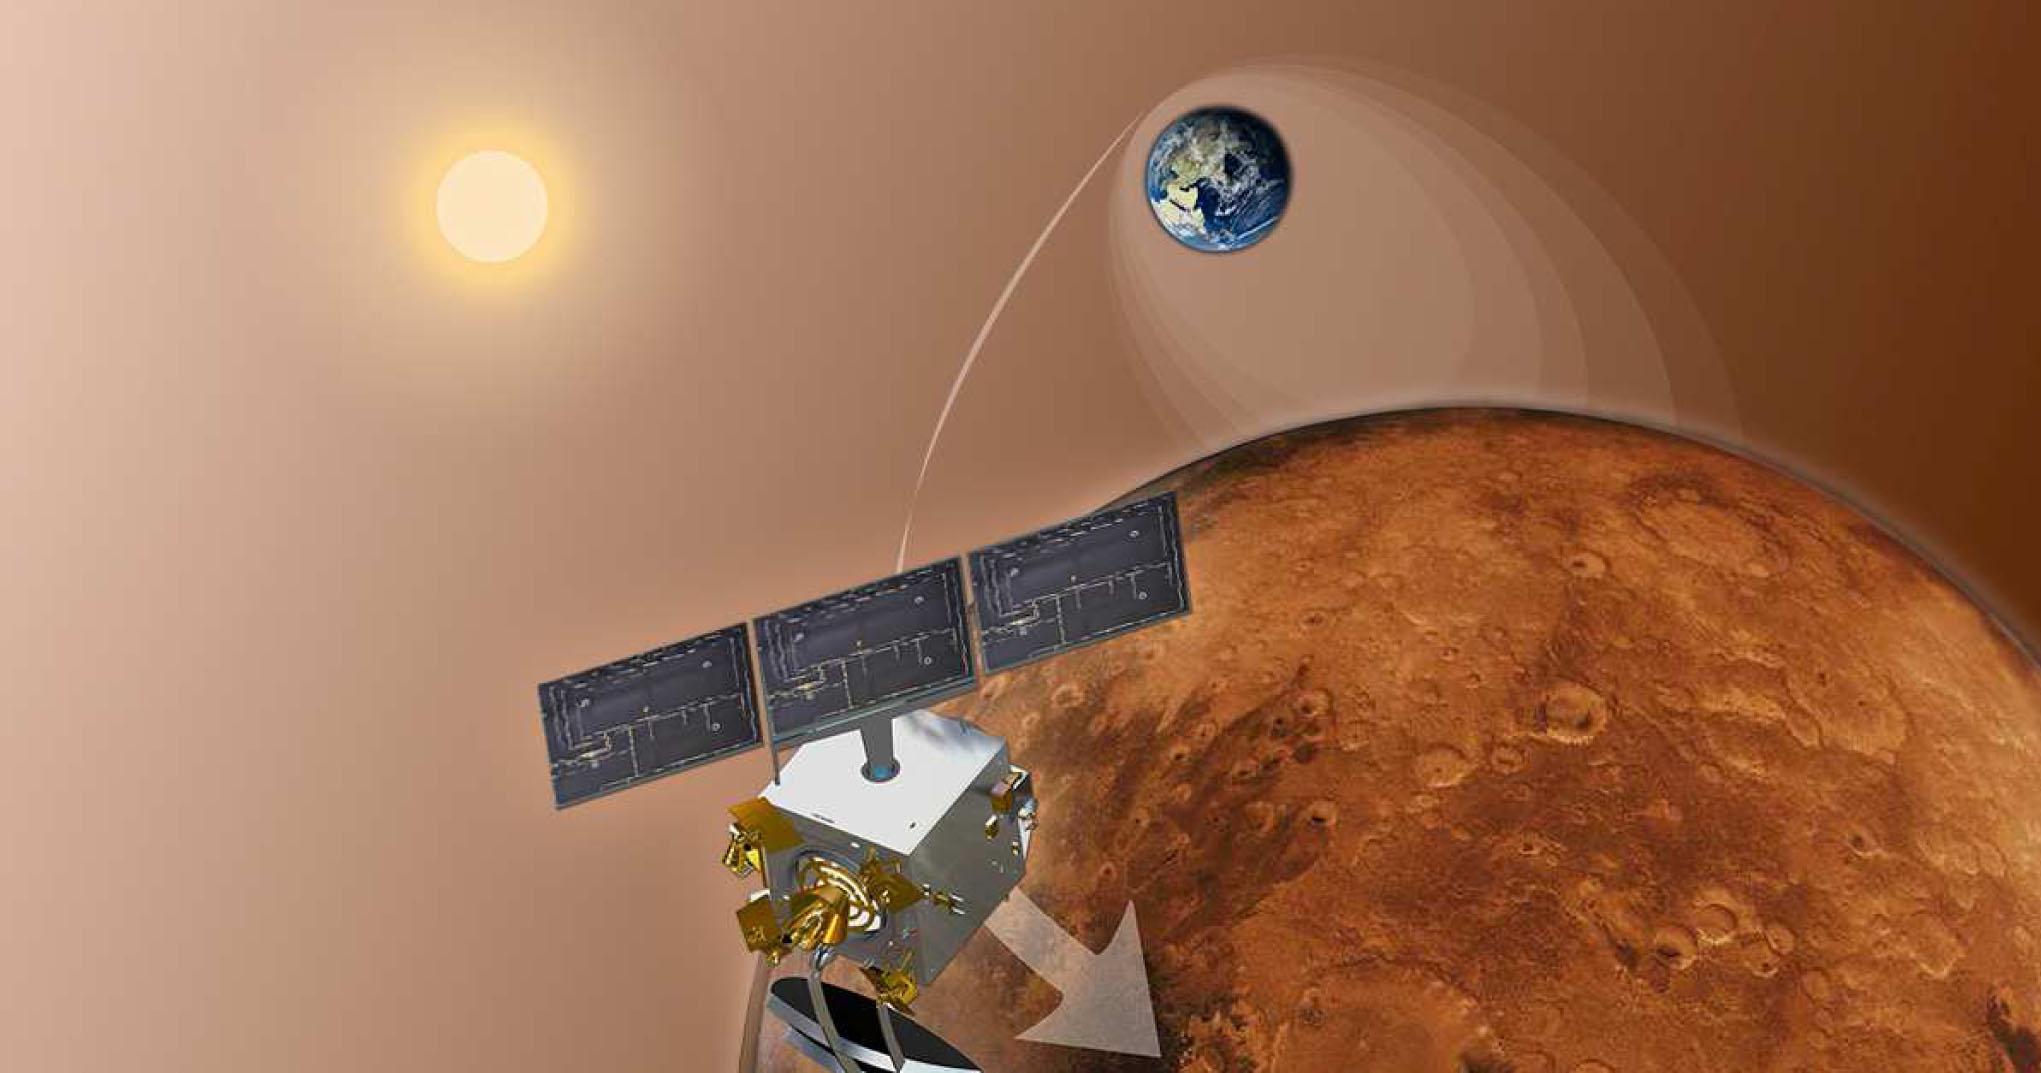 India's Mars Orbiter Mission (MOM)